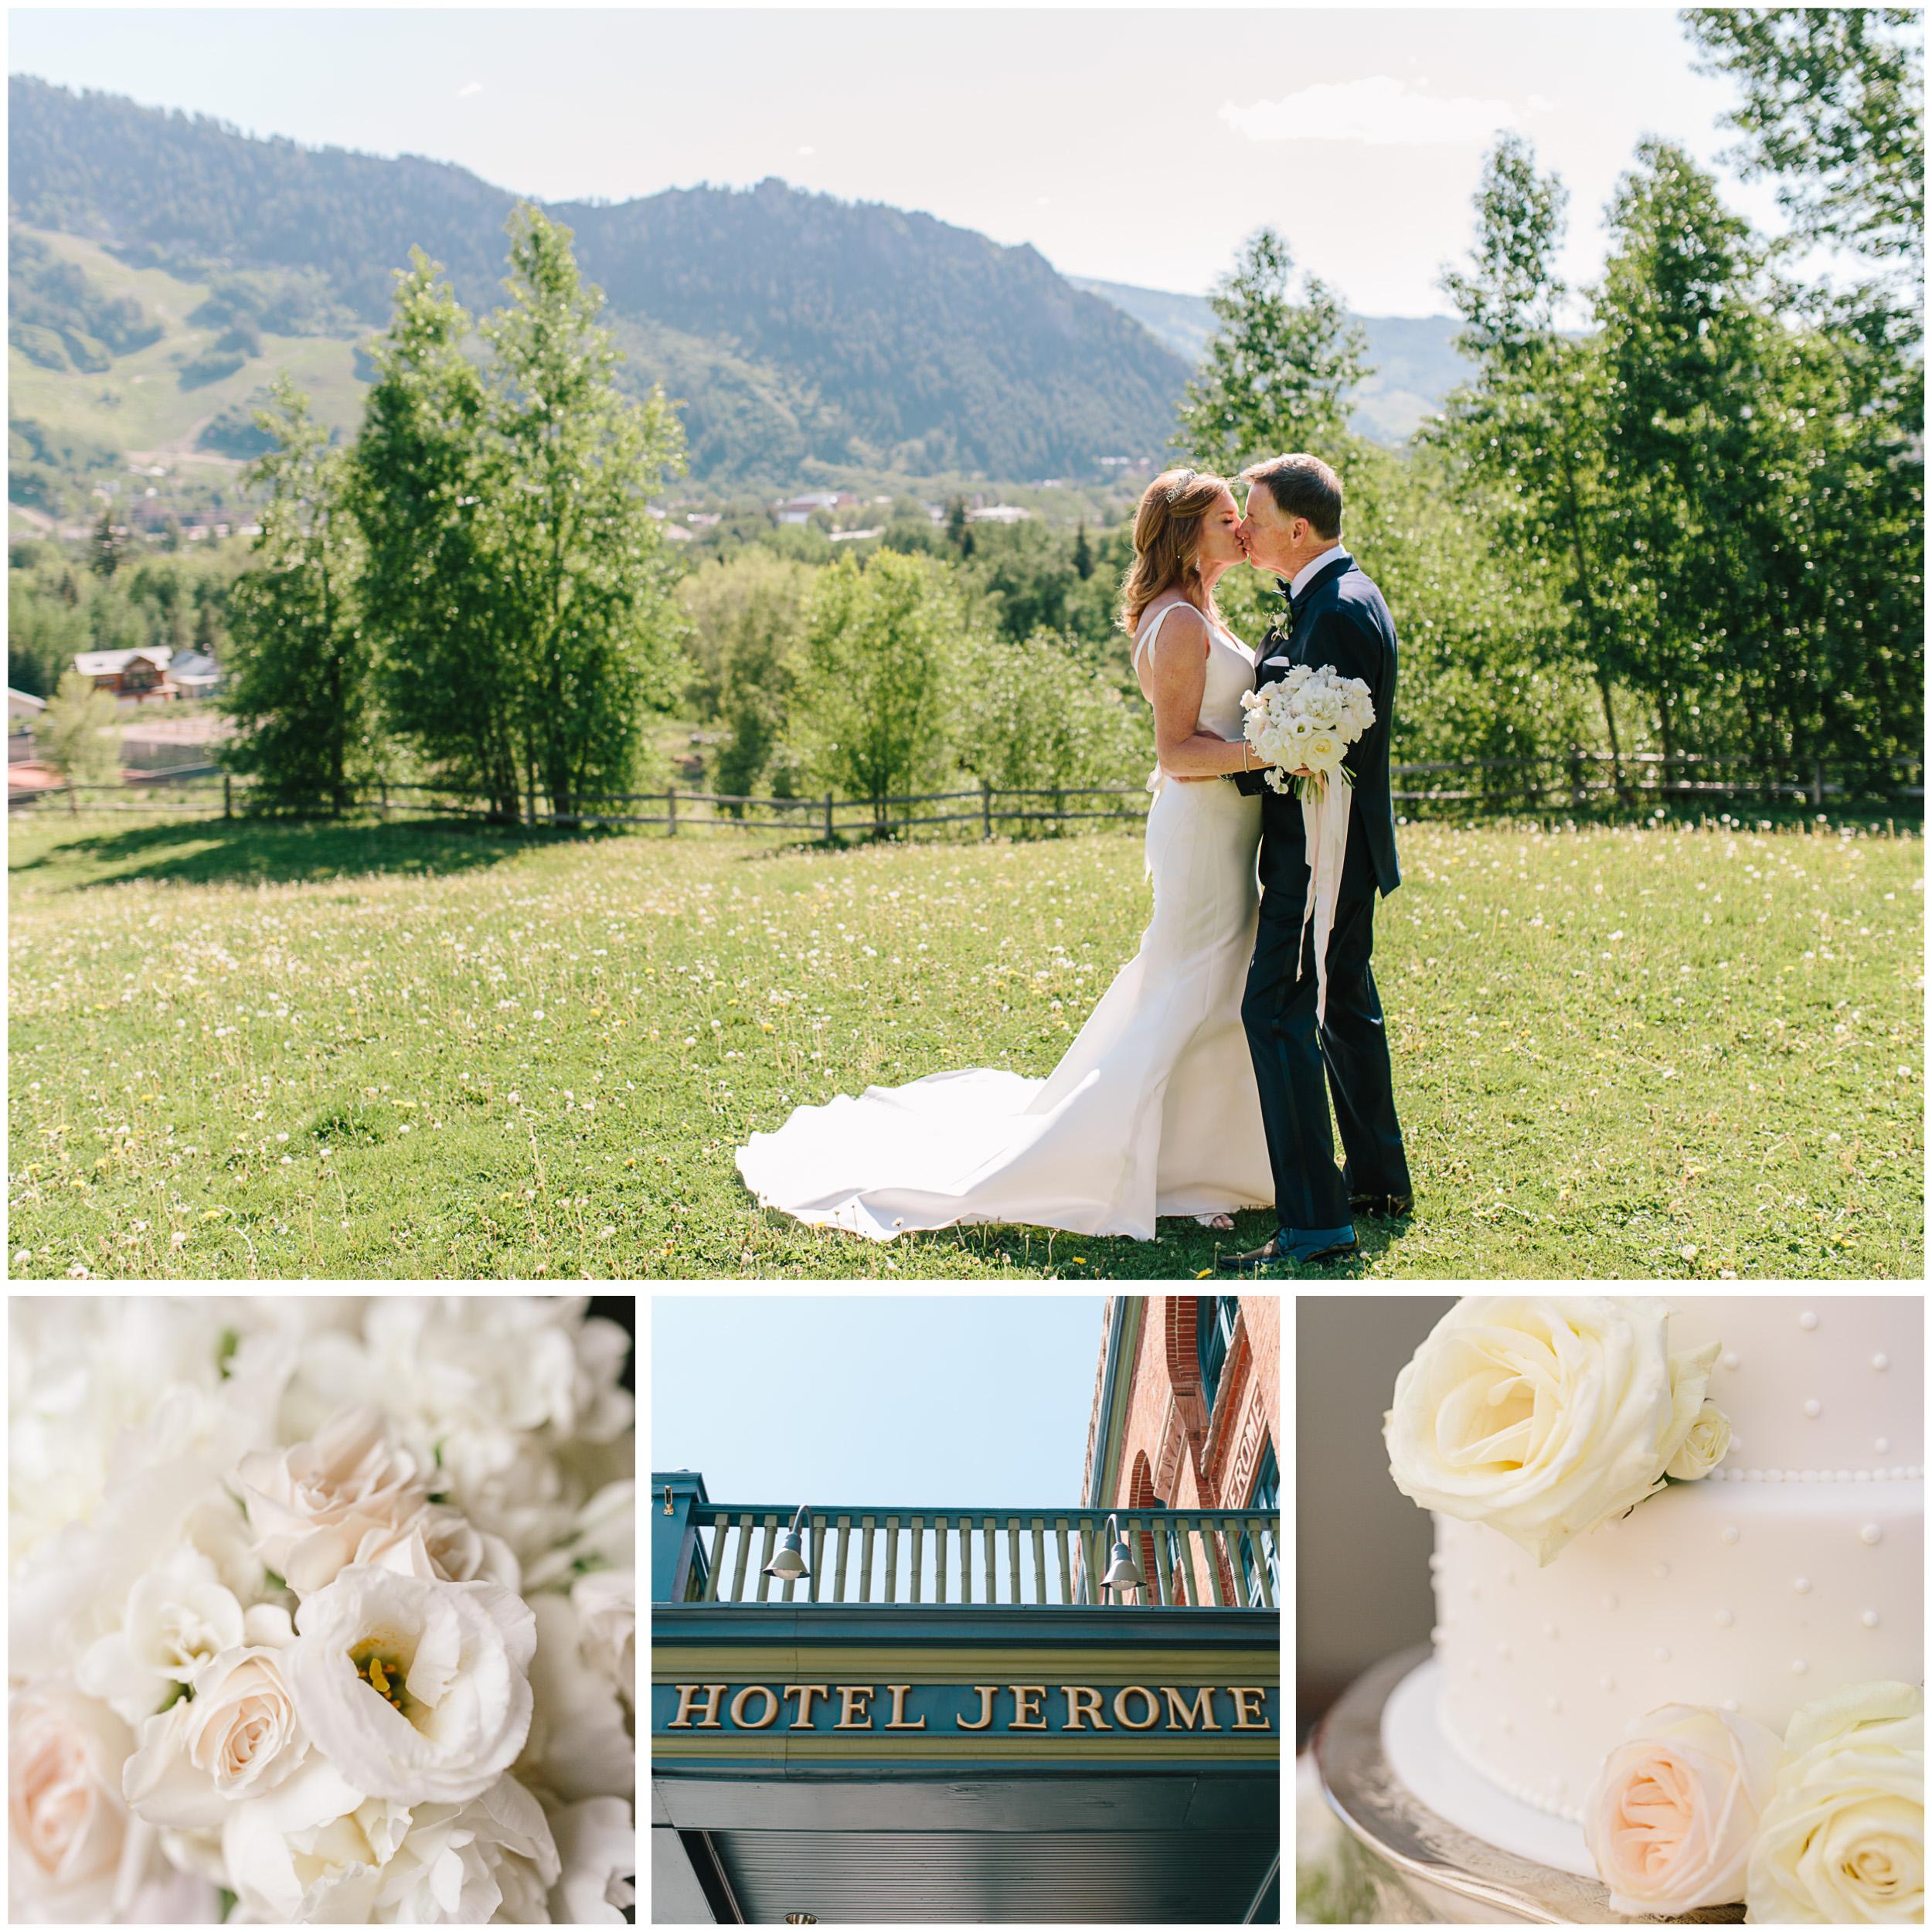 hotel_jerome_wedding_header_1.jpg